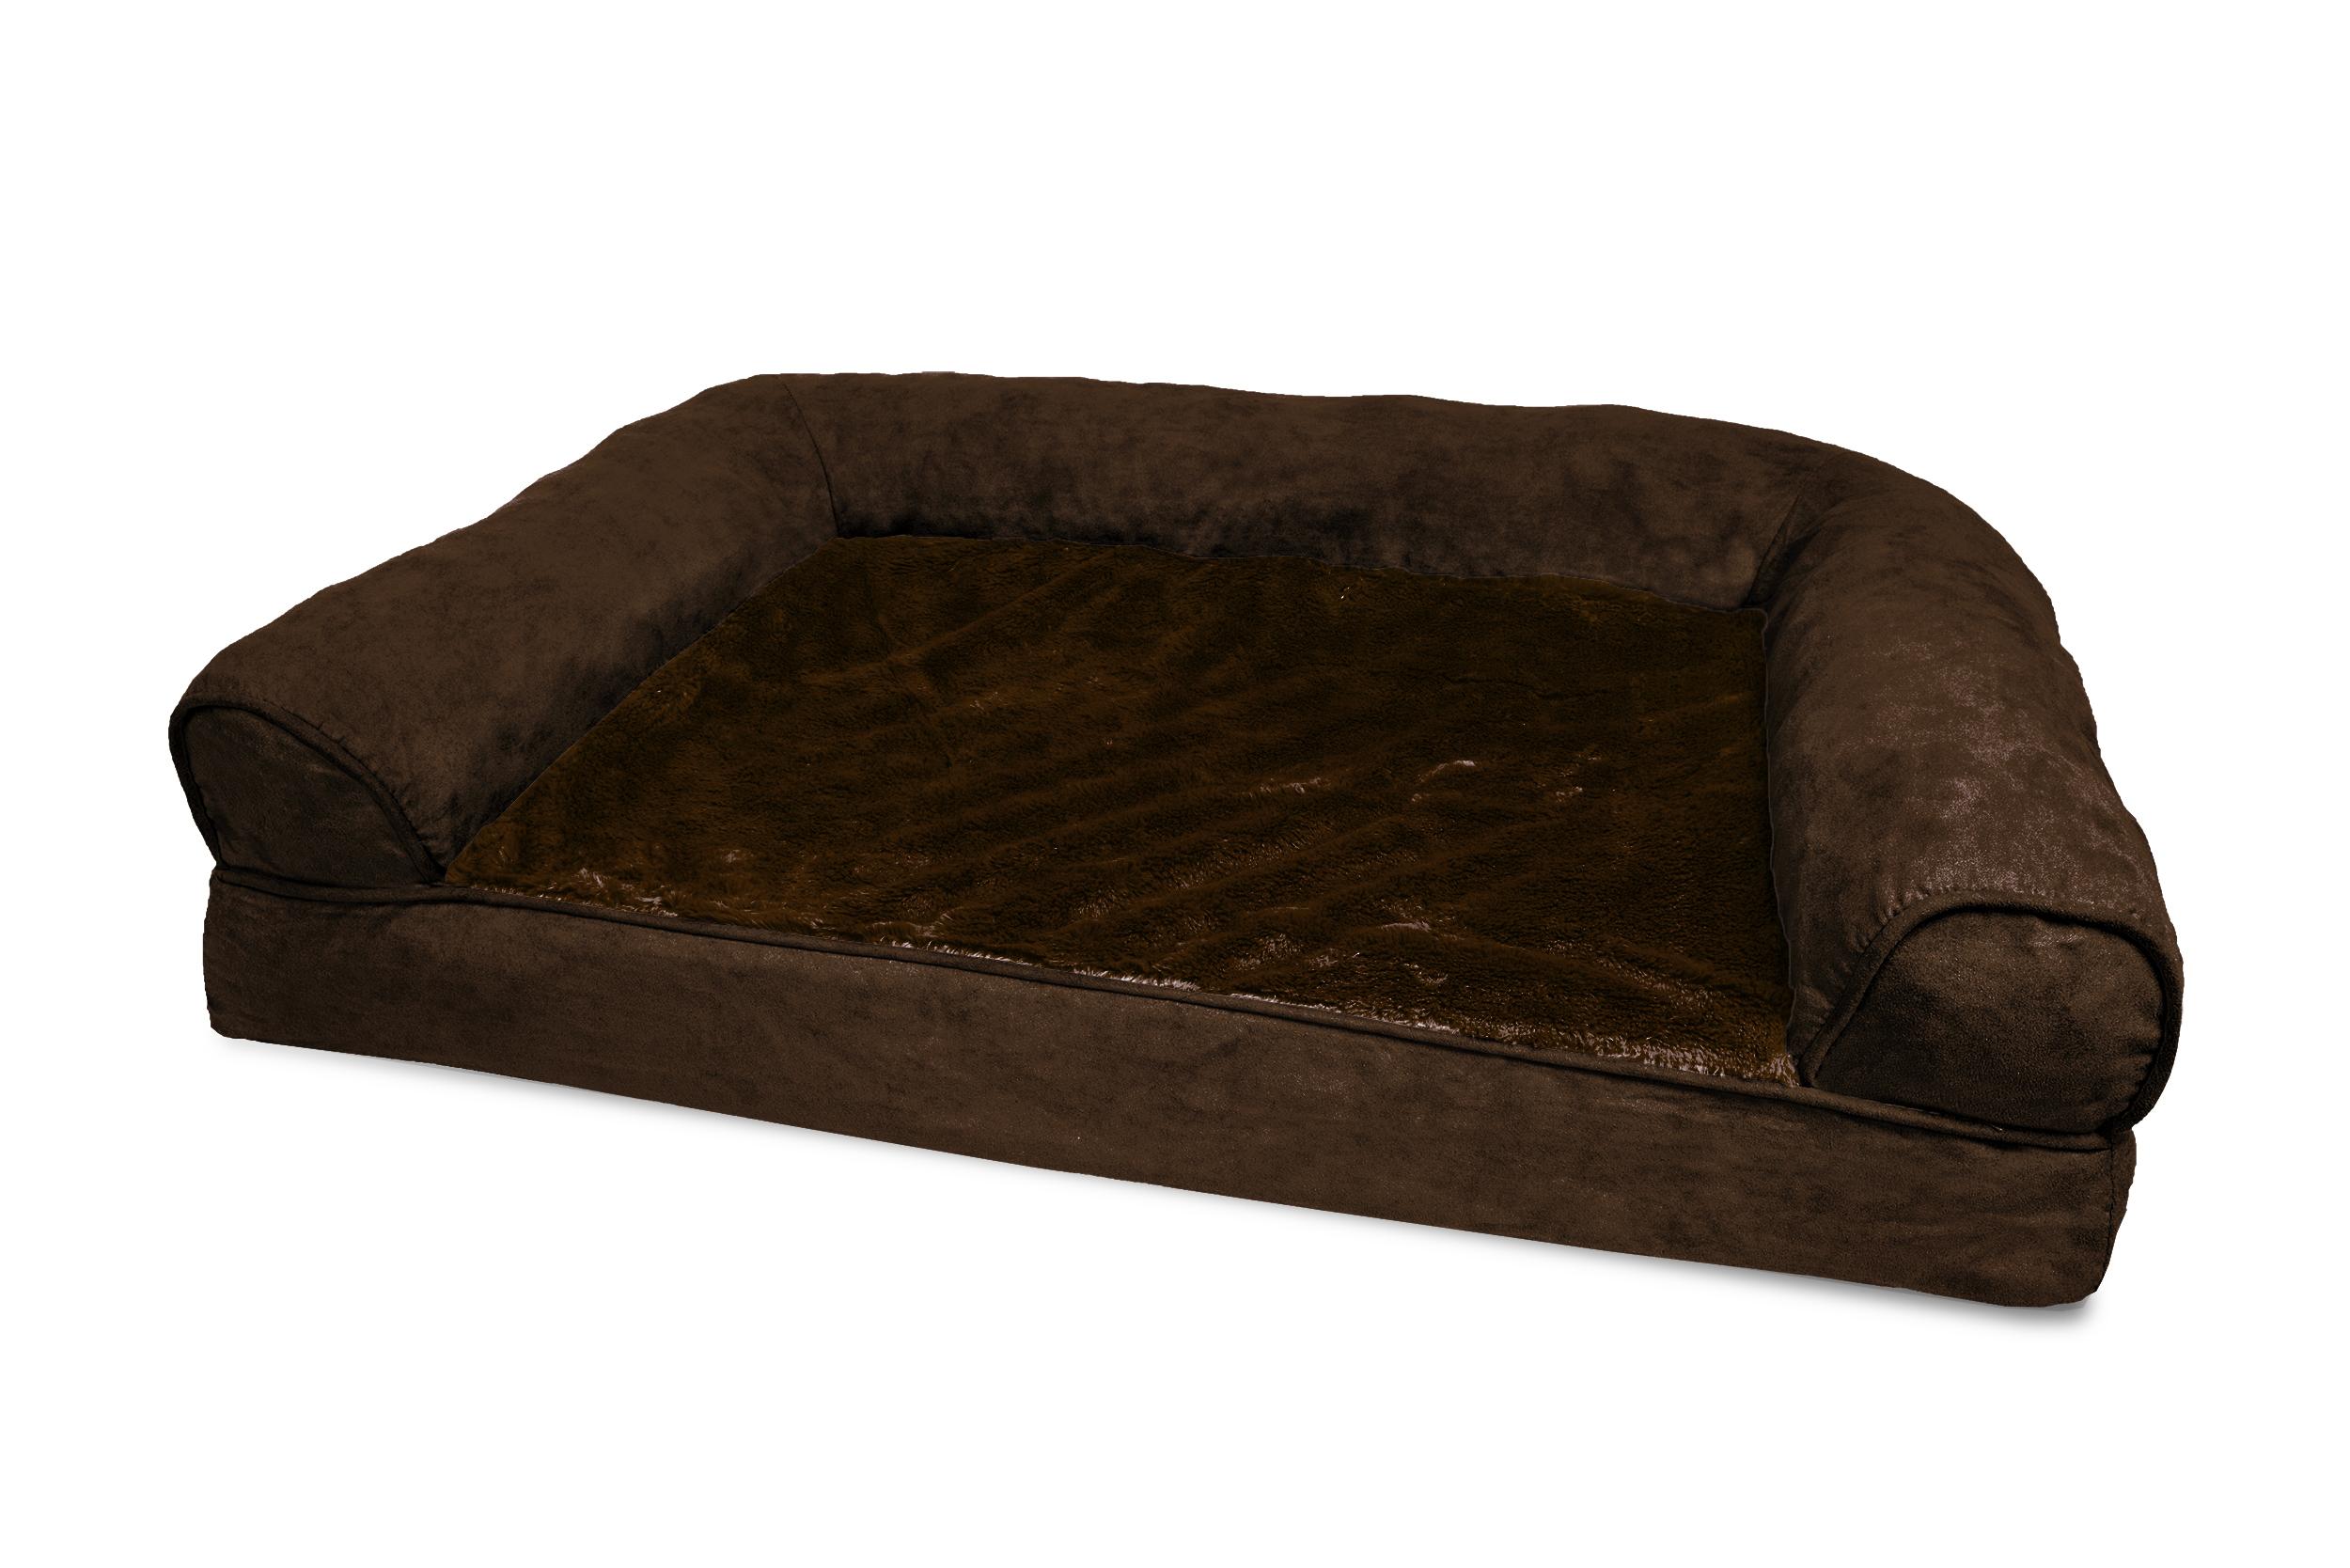 Furhaven Plush Suede Orthopedic Sofa Dog Bed